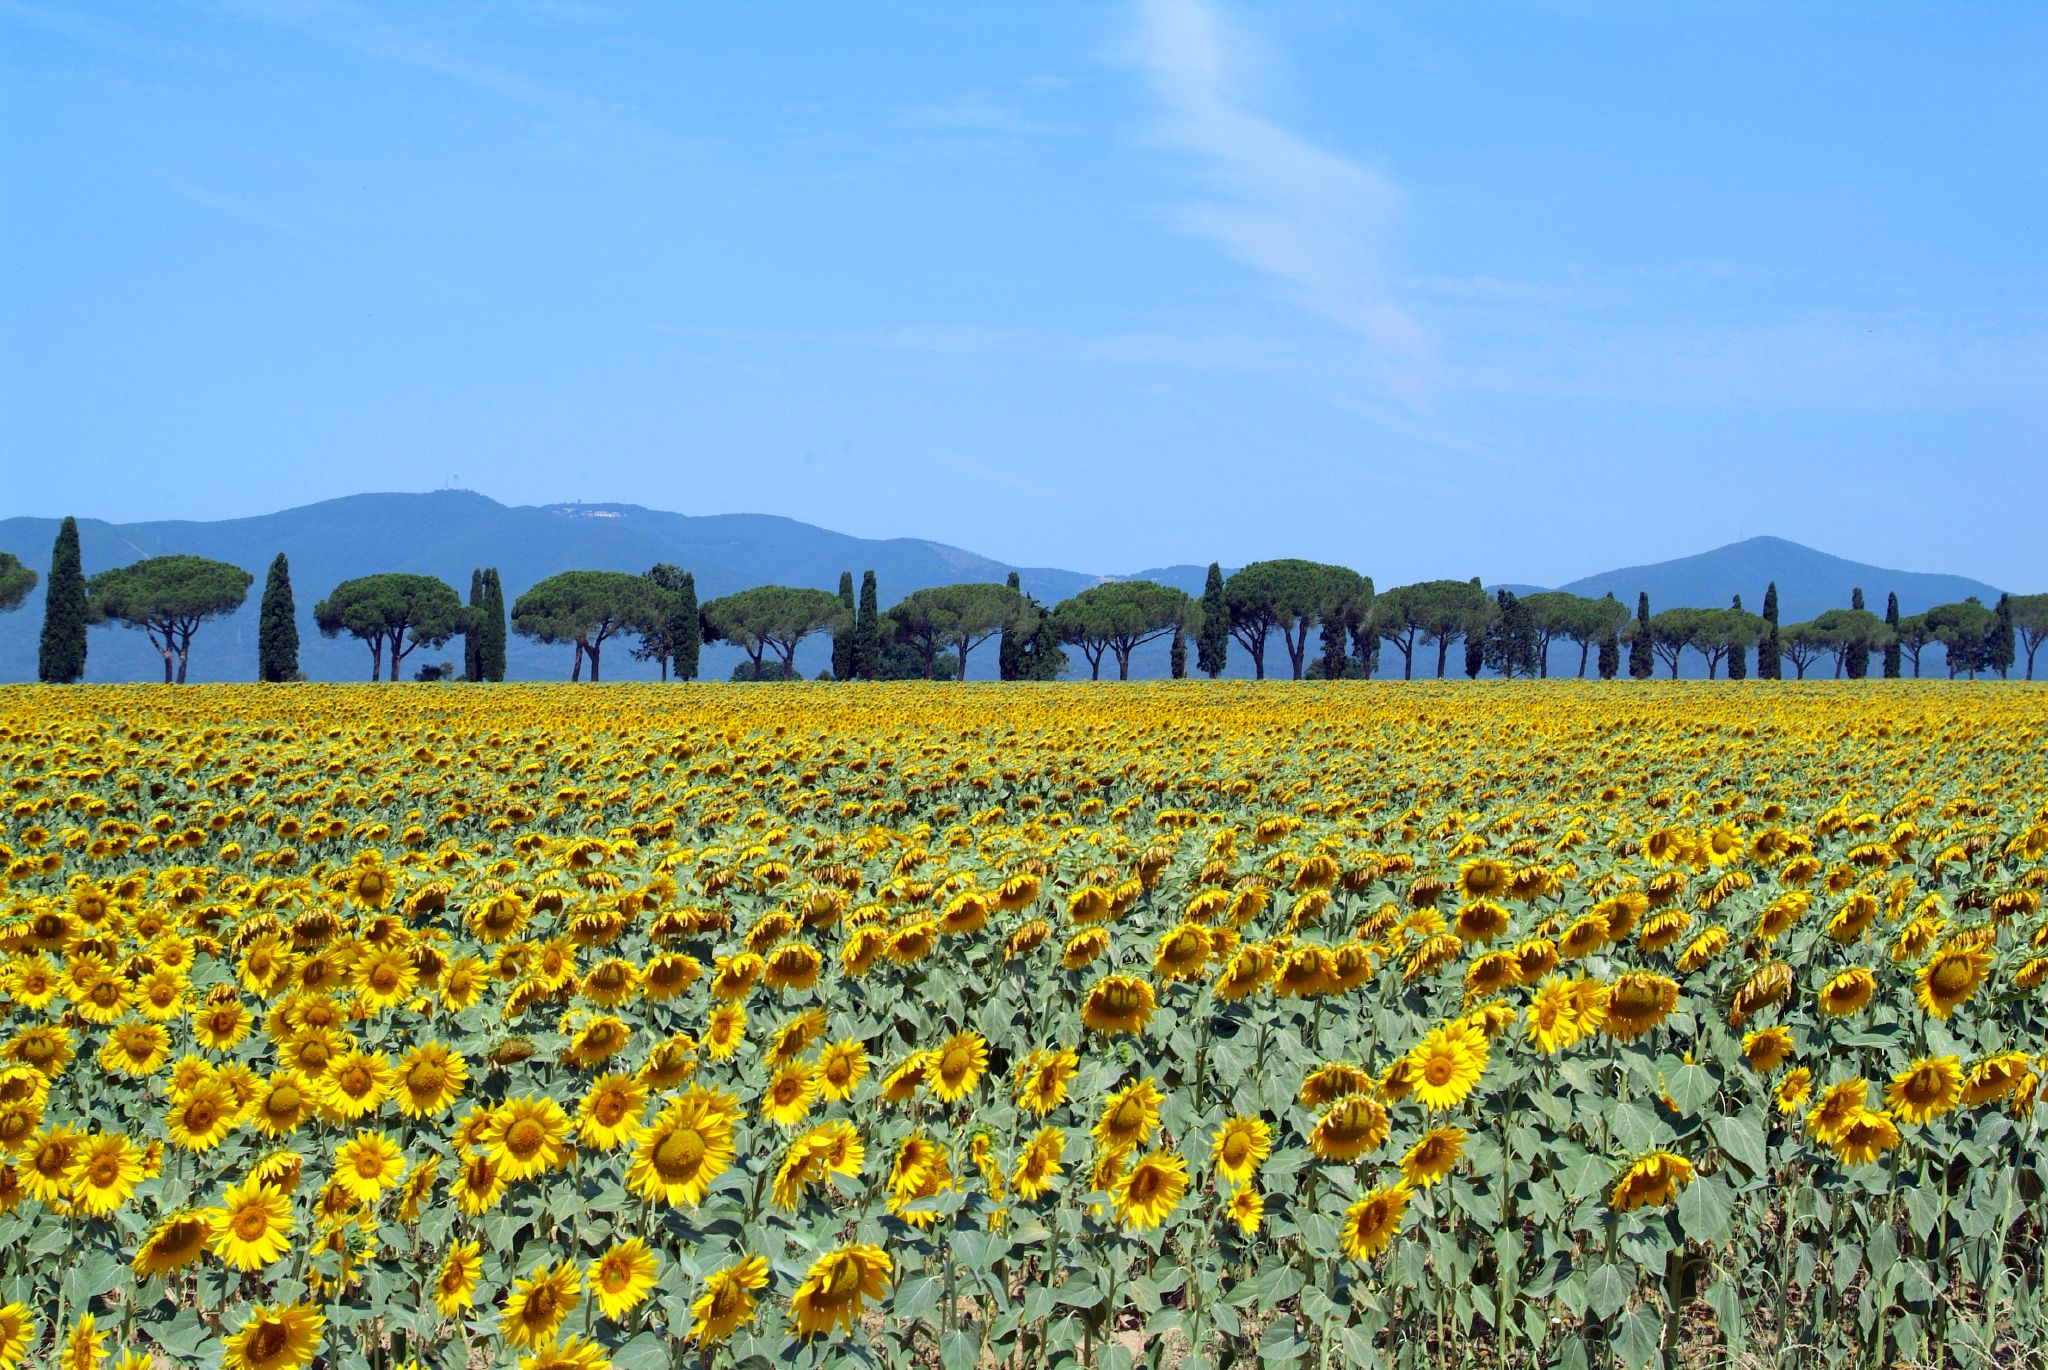 Sunflowers_in_bloom_-_Maremma_Toscana_-_